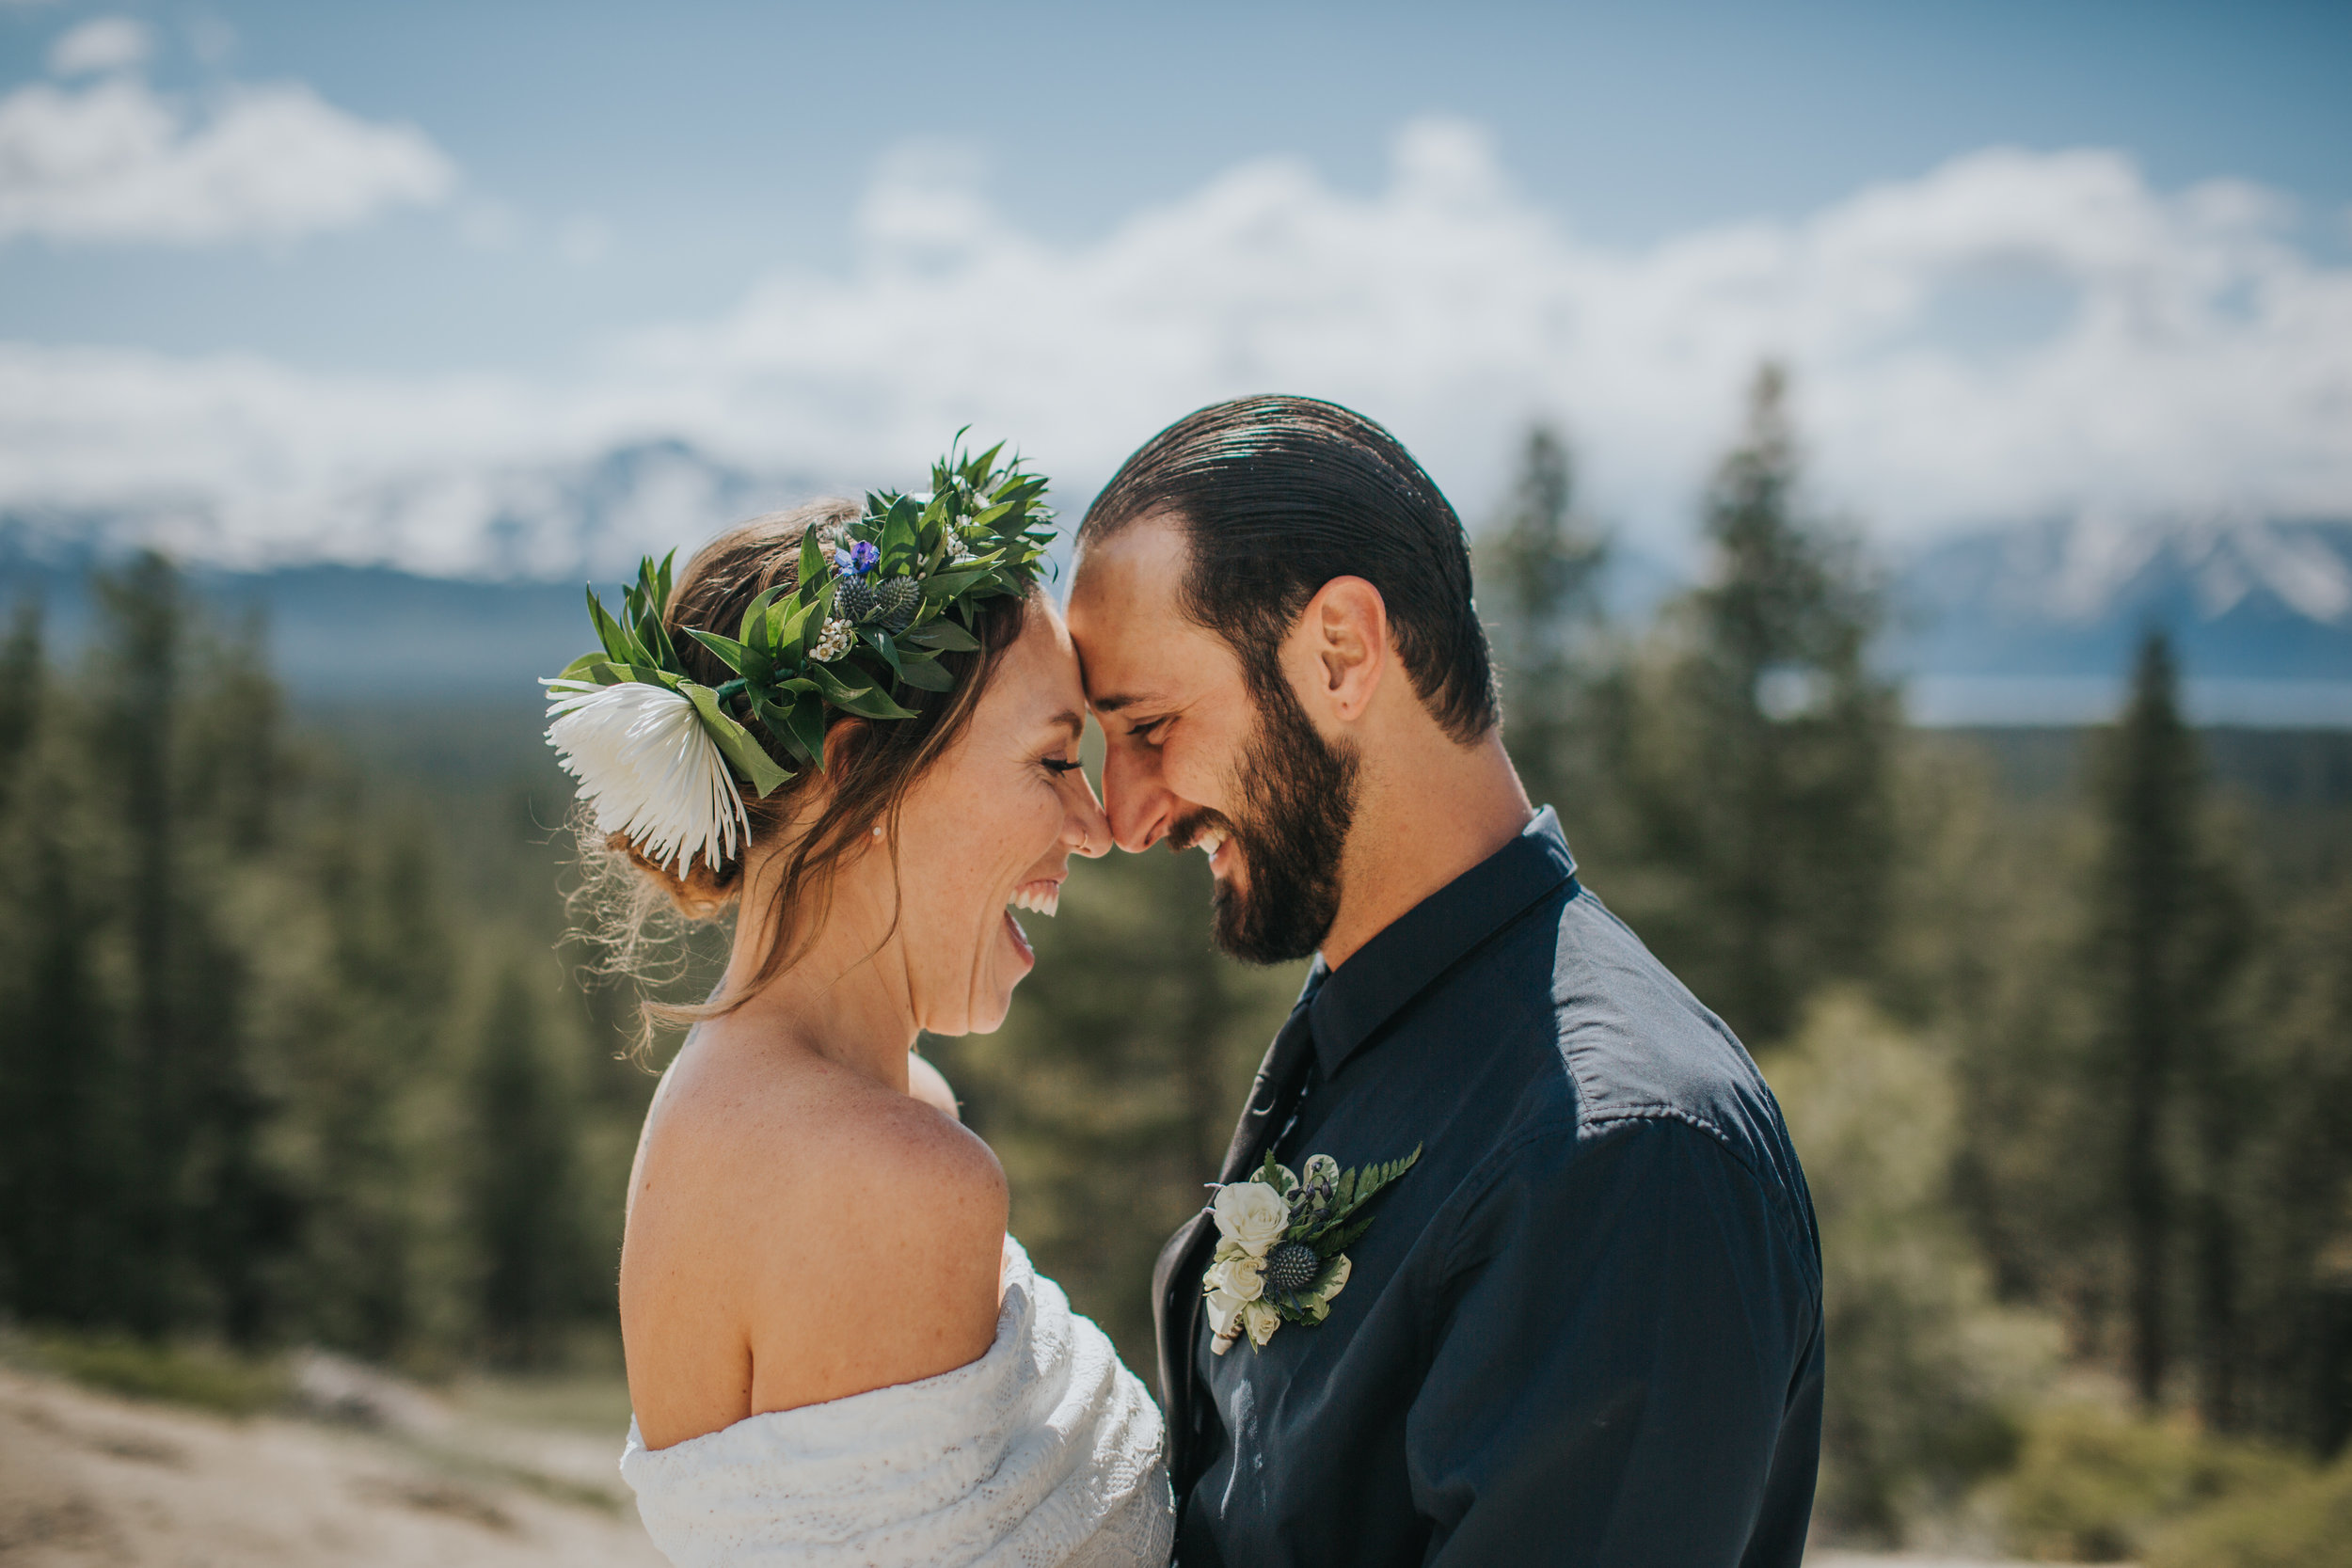 south-lake-tahoe-elopement-valerie-lendvay-photo-040.jpg